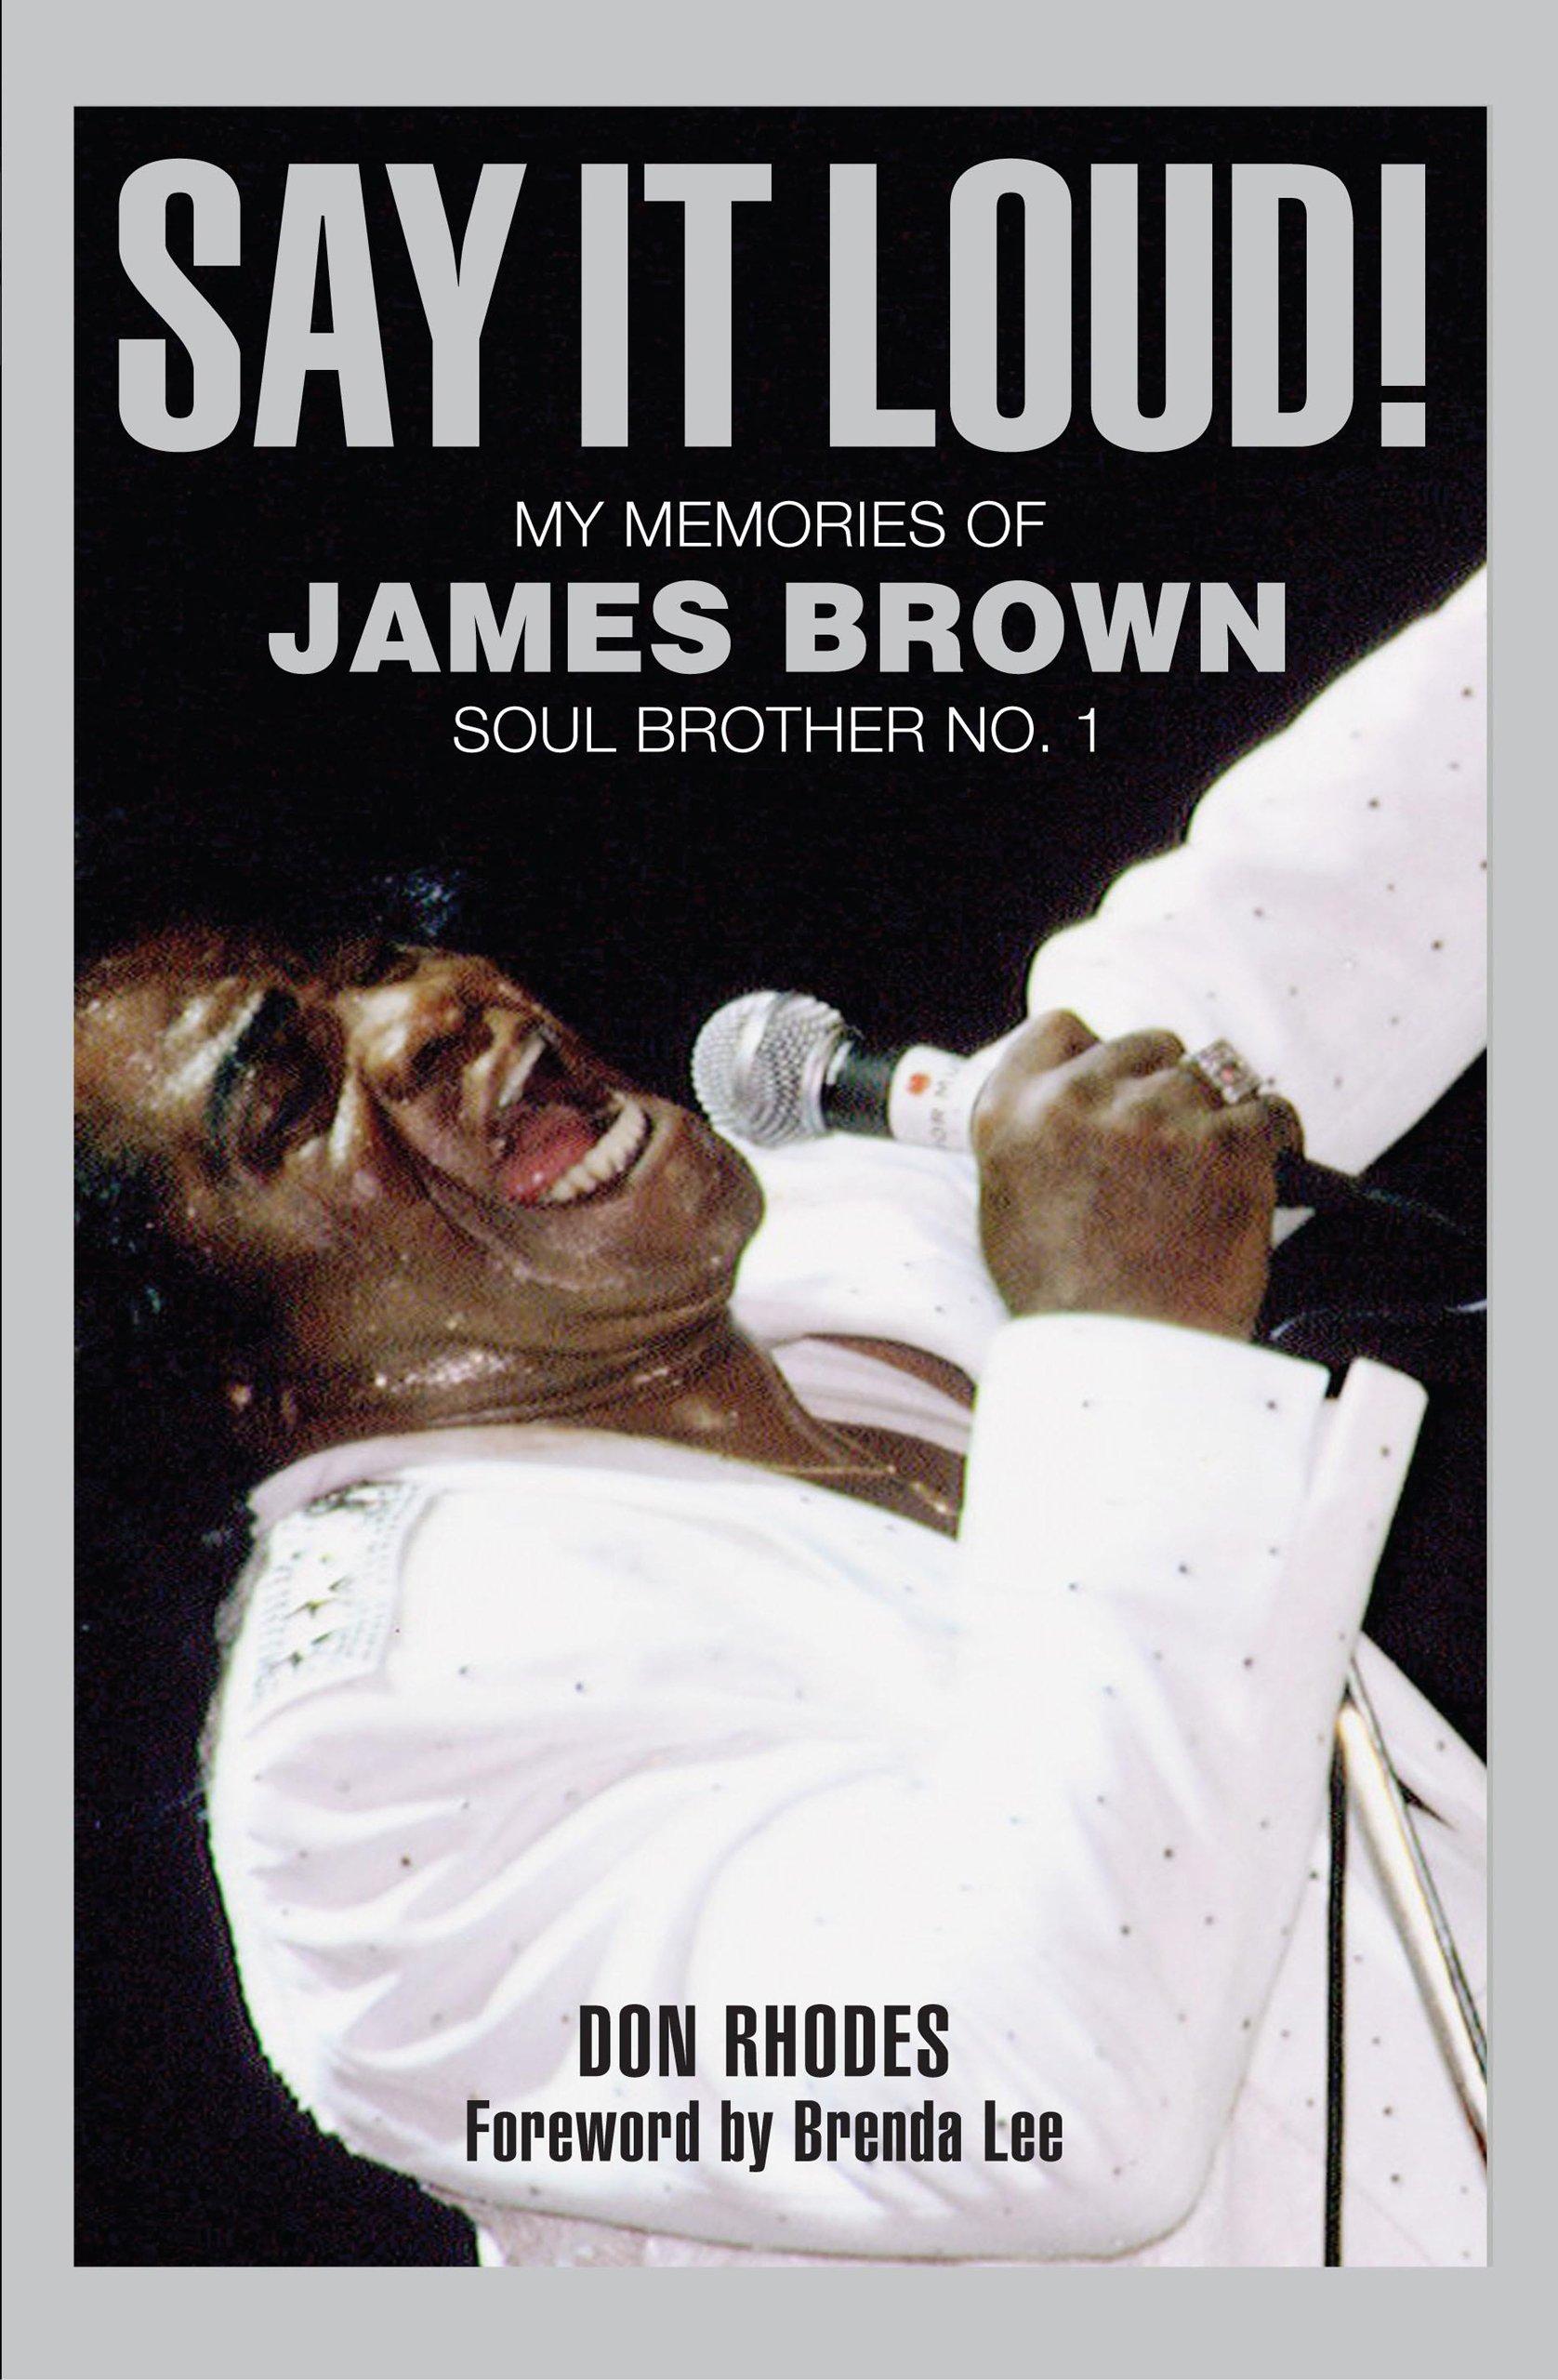 Say It Loud!: My Memories of James Brown, Soul Brother No. 1